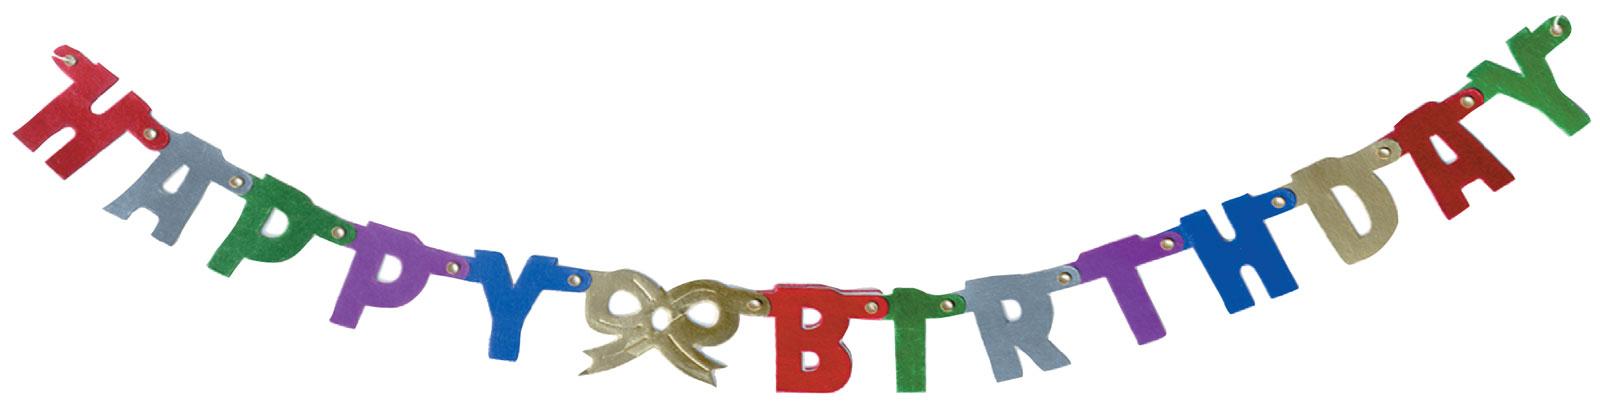 1600x418 Happy Birthday Banner Clip Art